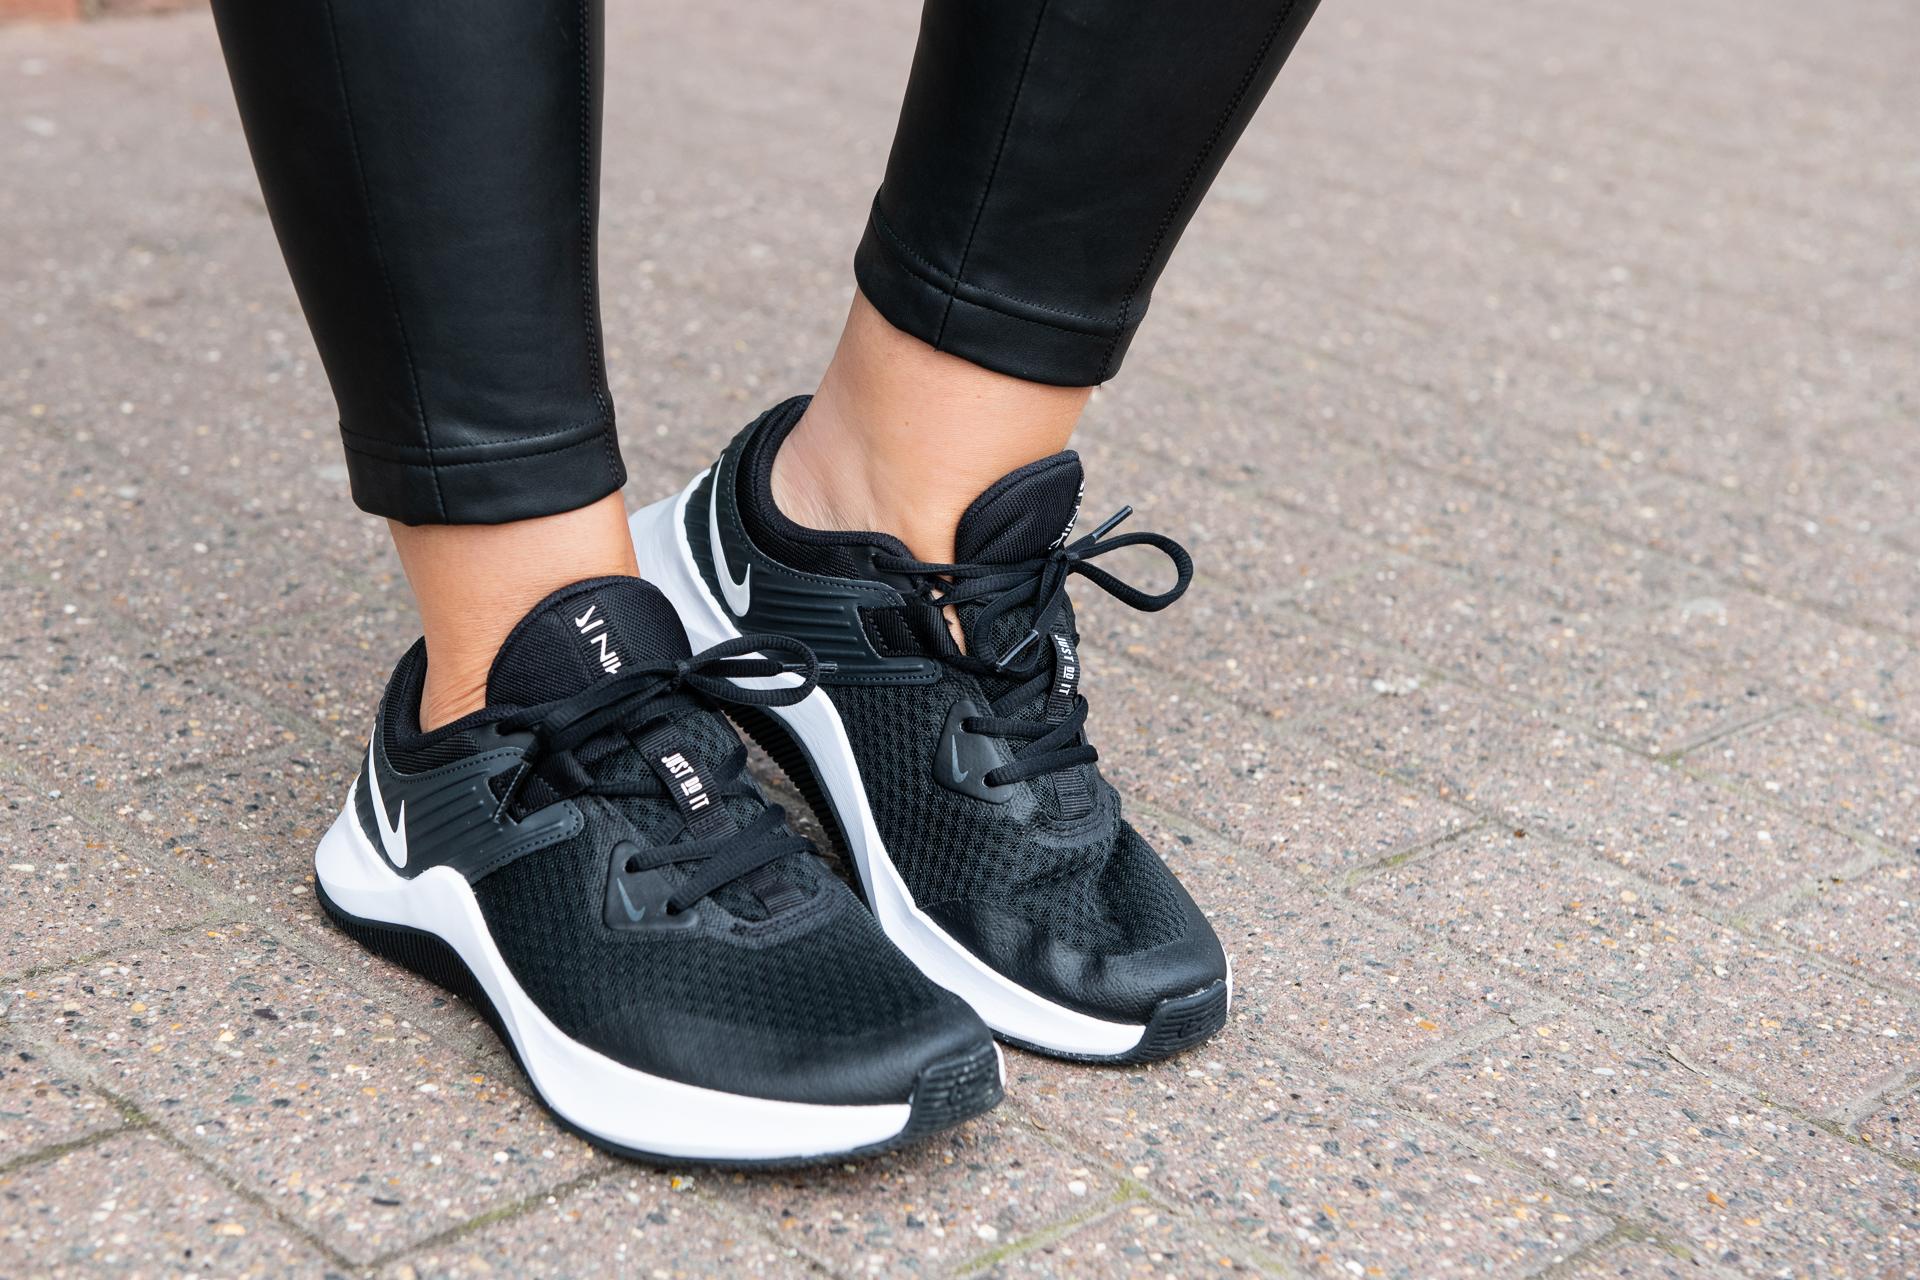 NIKE women's trainers